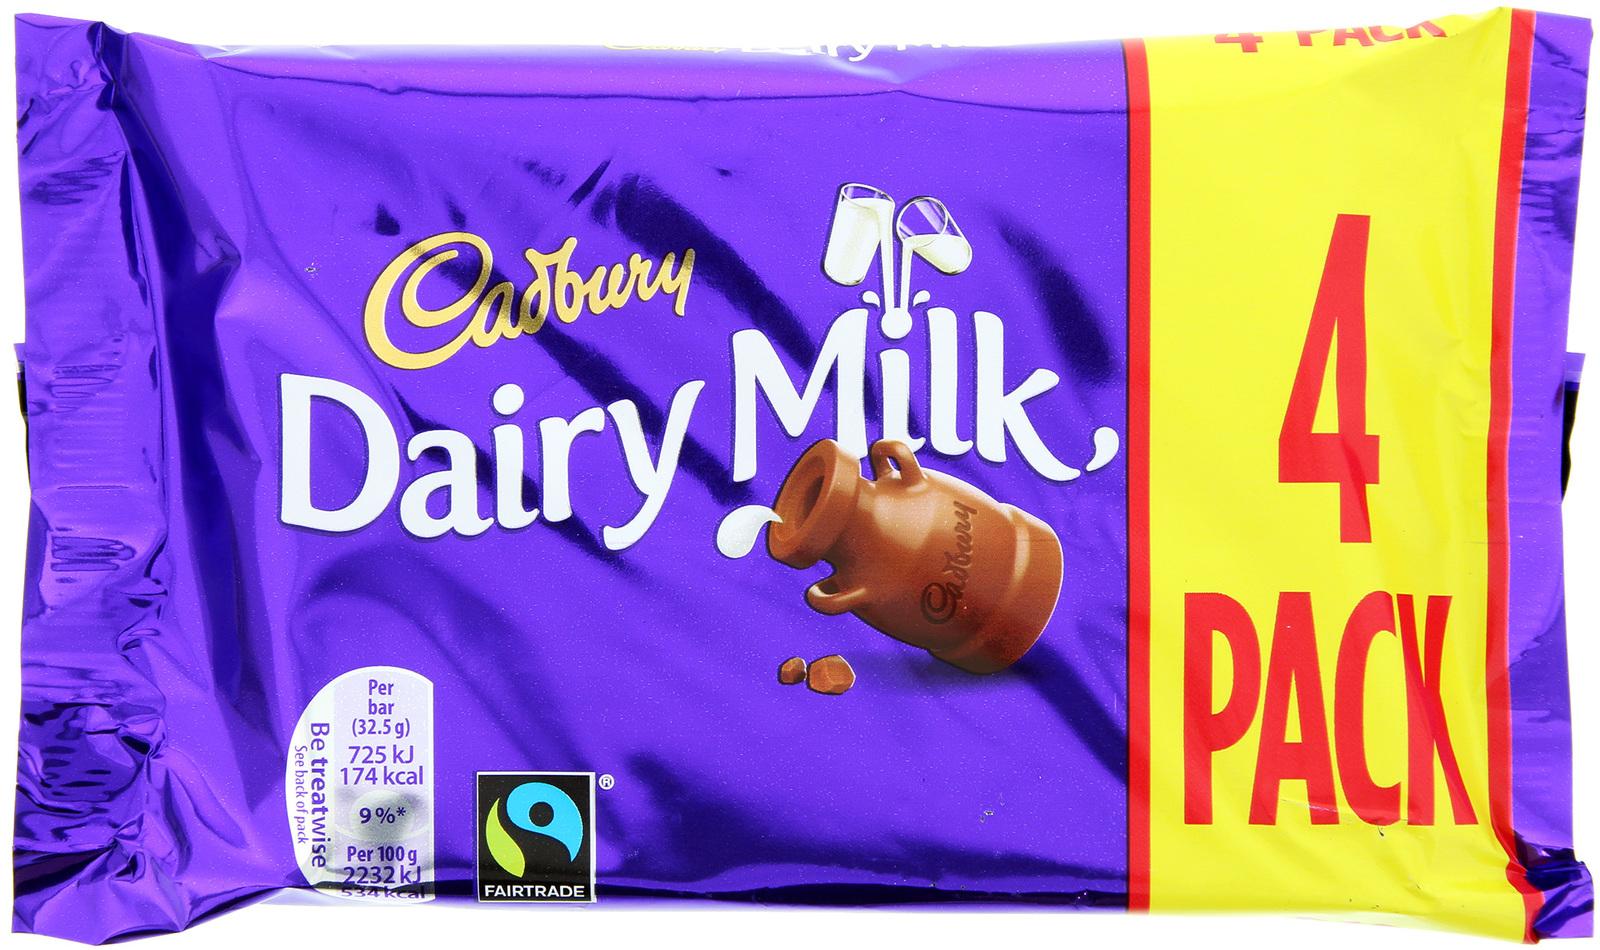 Cadbury Dairy Milk Chocolate Bars 4pk image